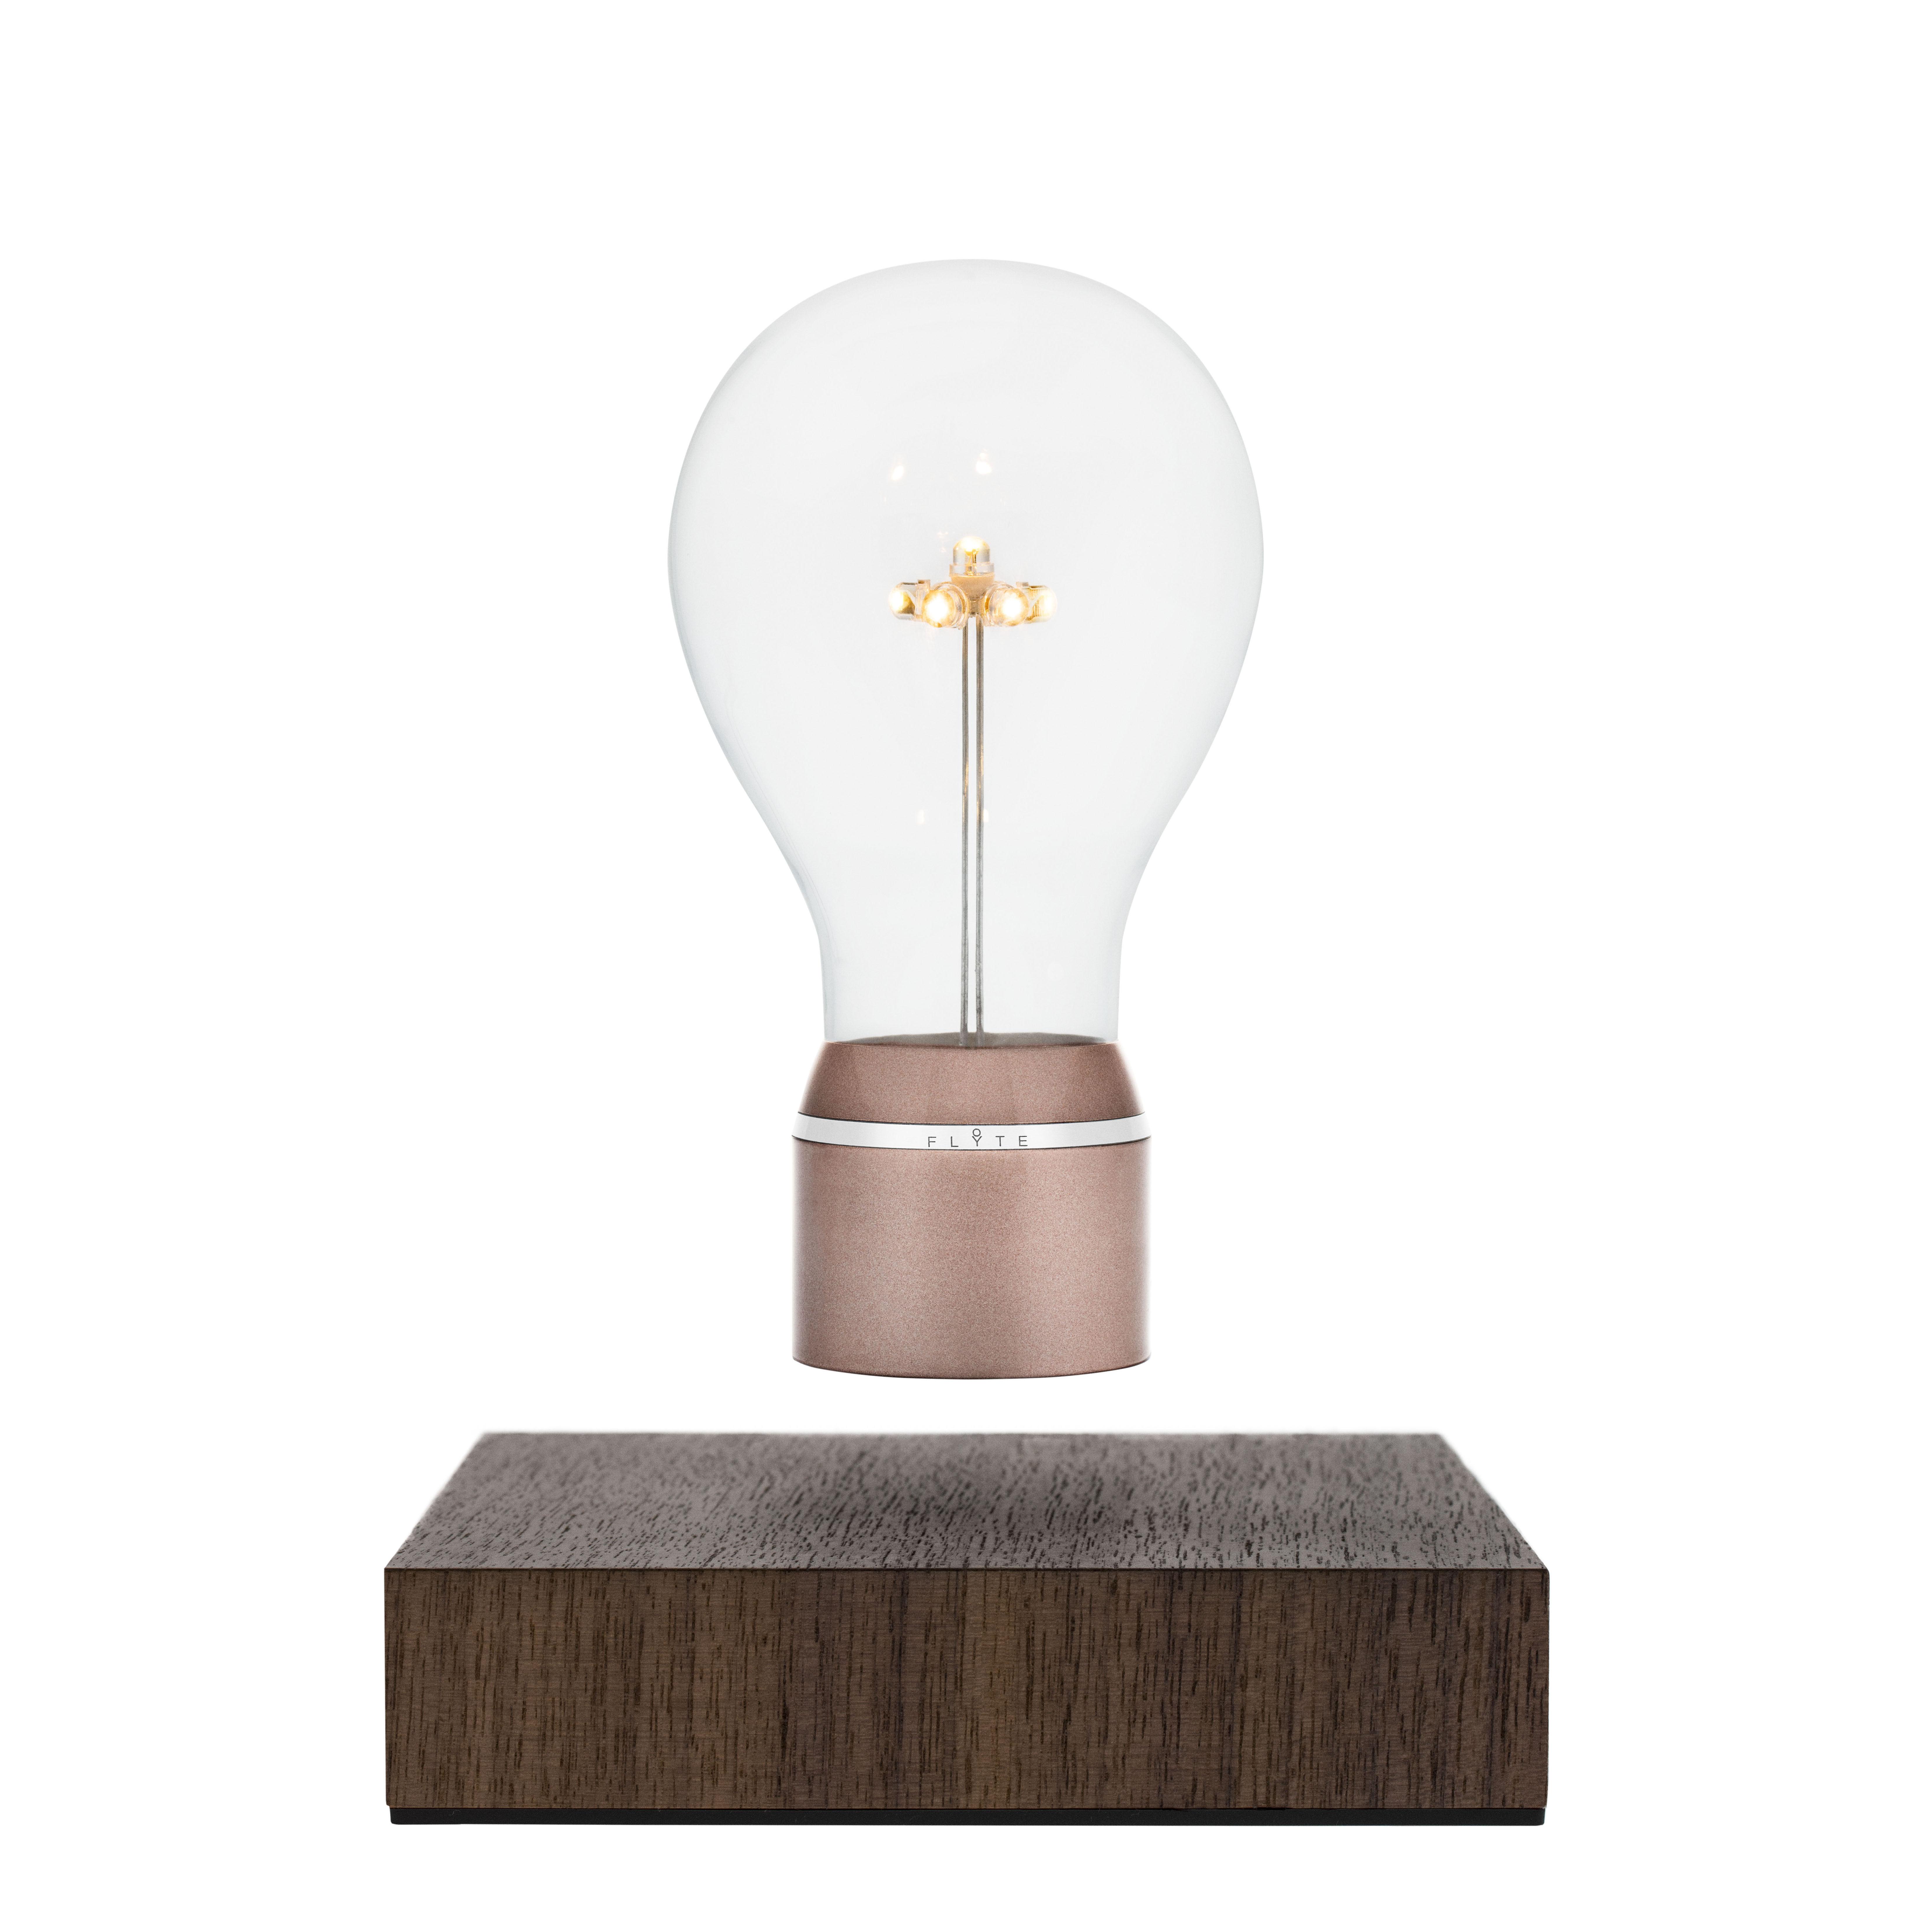 Lighting - Table Lamps - Flyte Buckminster Table lamp - / Levitating bulb by Flyte - Copper / Walnut base - Glass, Metal, Walnut